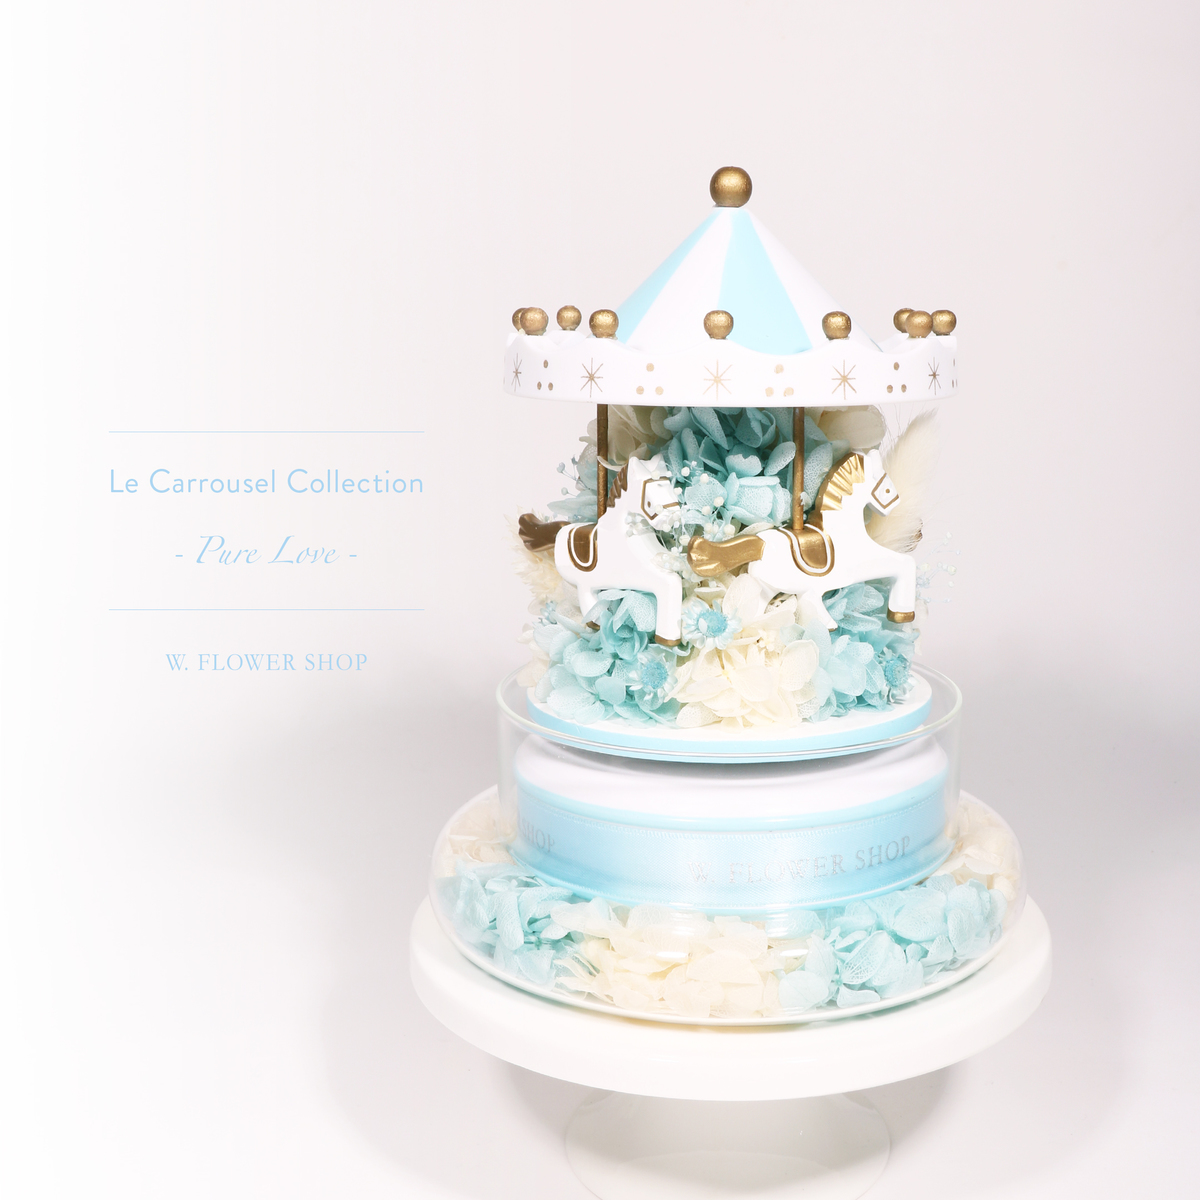 LE CARROUSEL COLLECTION - Pure Love (Blue)